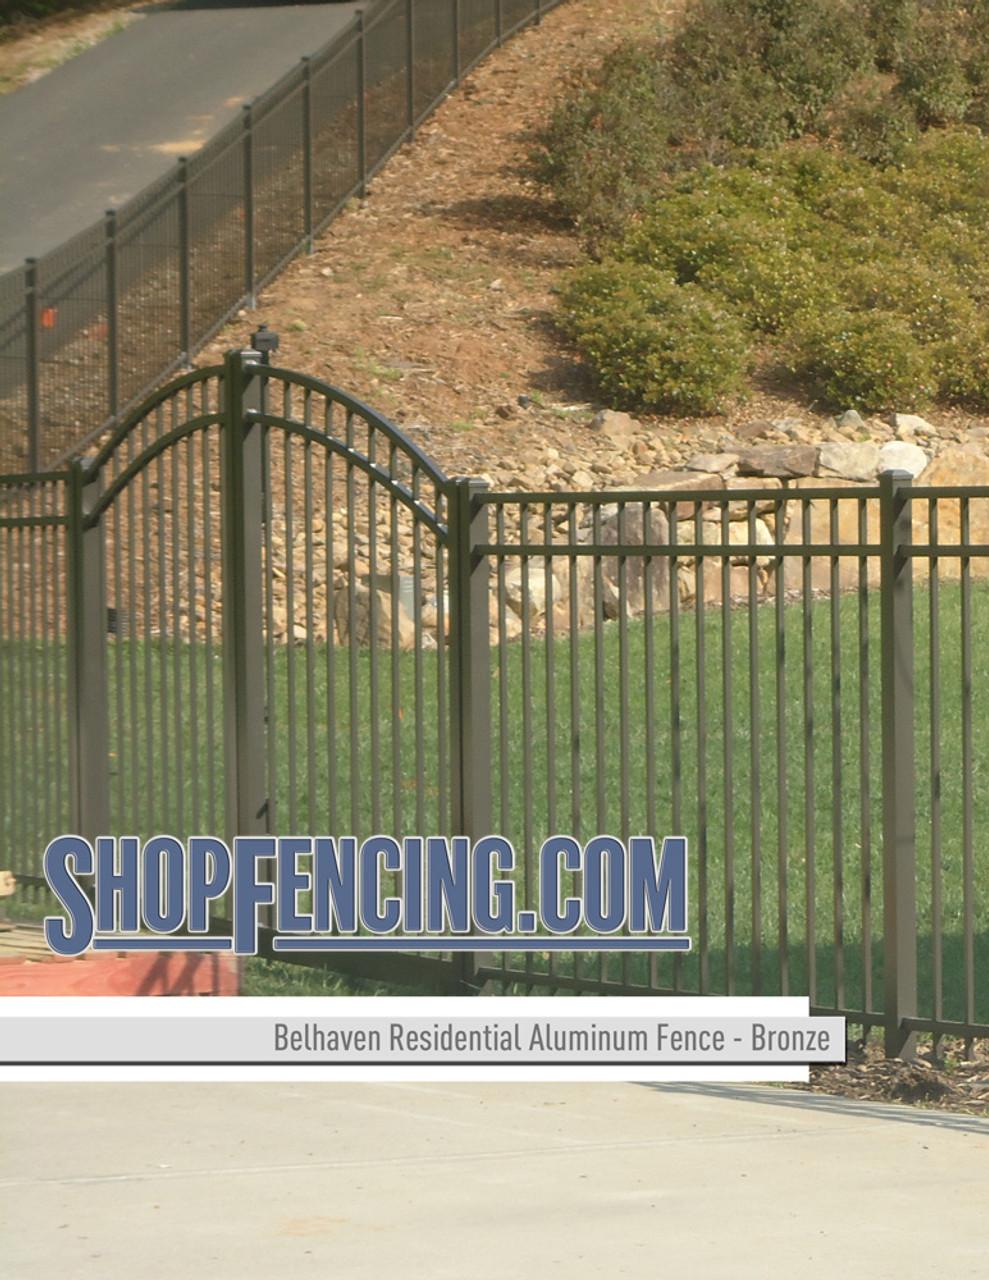 Bronze Residential Belhaven Aluminum Fencing From ShopFencing.com